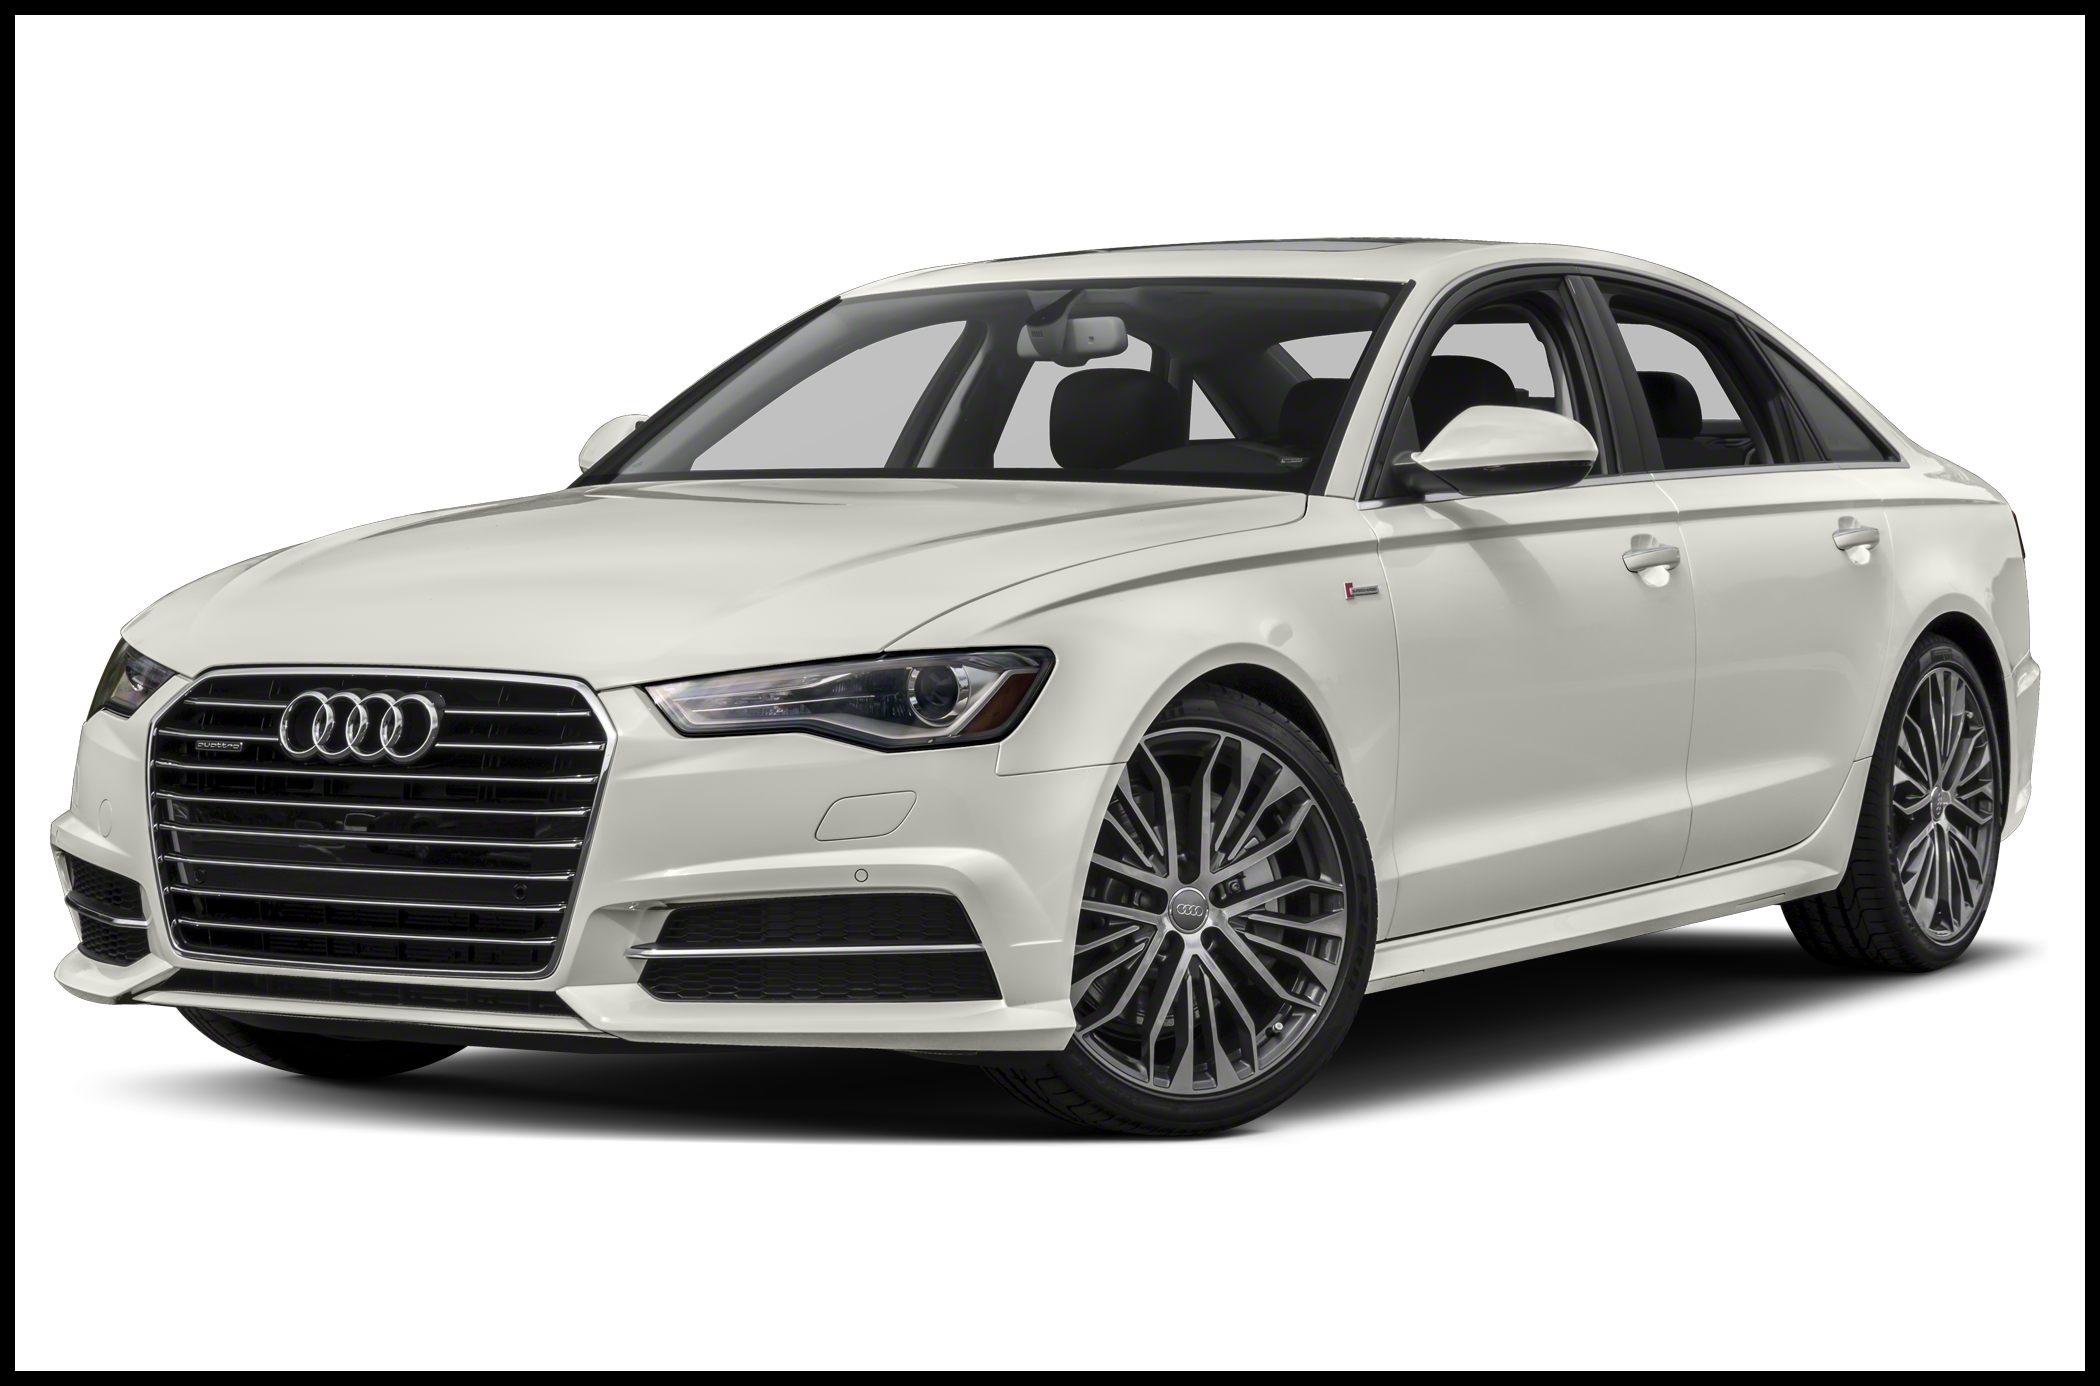 2016 Audi A6 3 0 TDI Premium Plus 4dr All wheel Drive quattro Sedan Pricing and Options